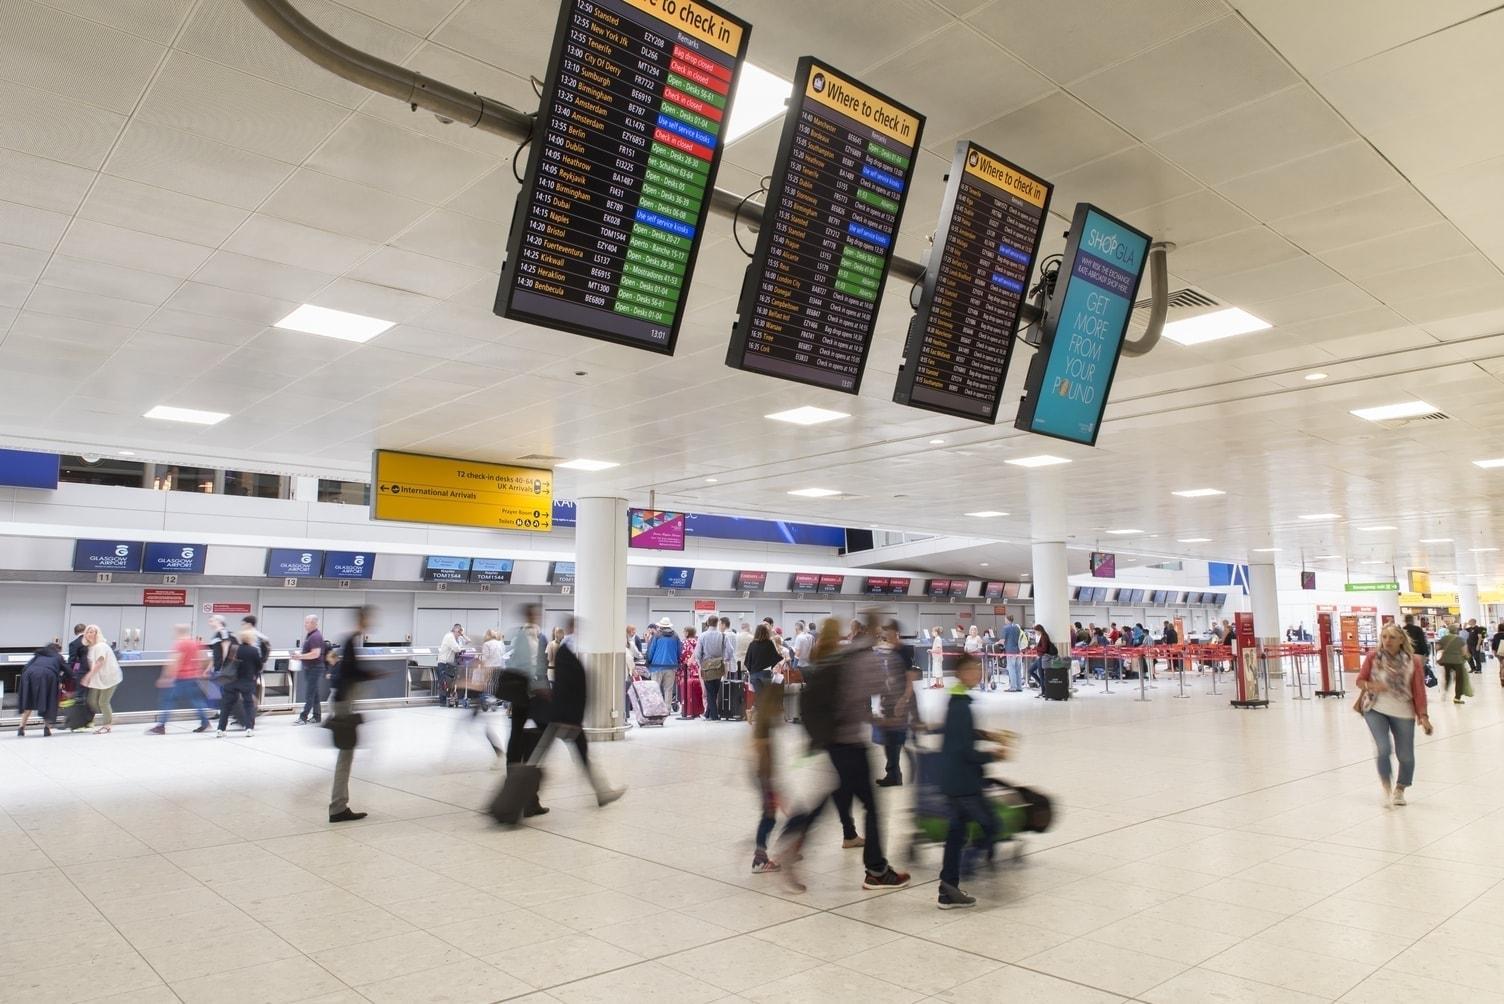 Glasgow airport interior